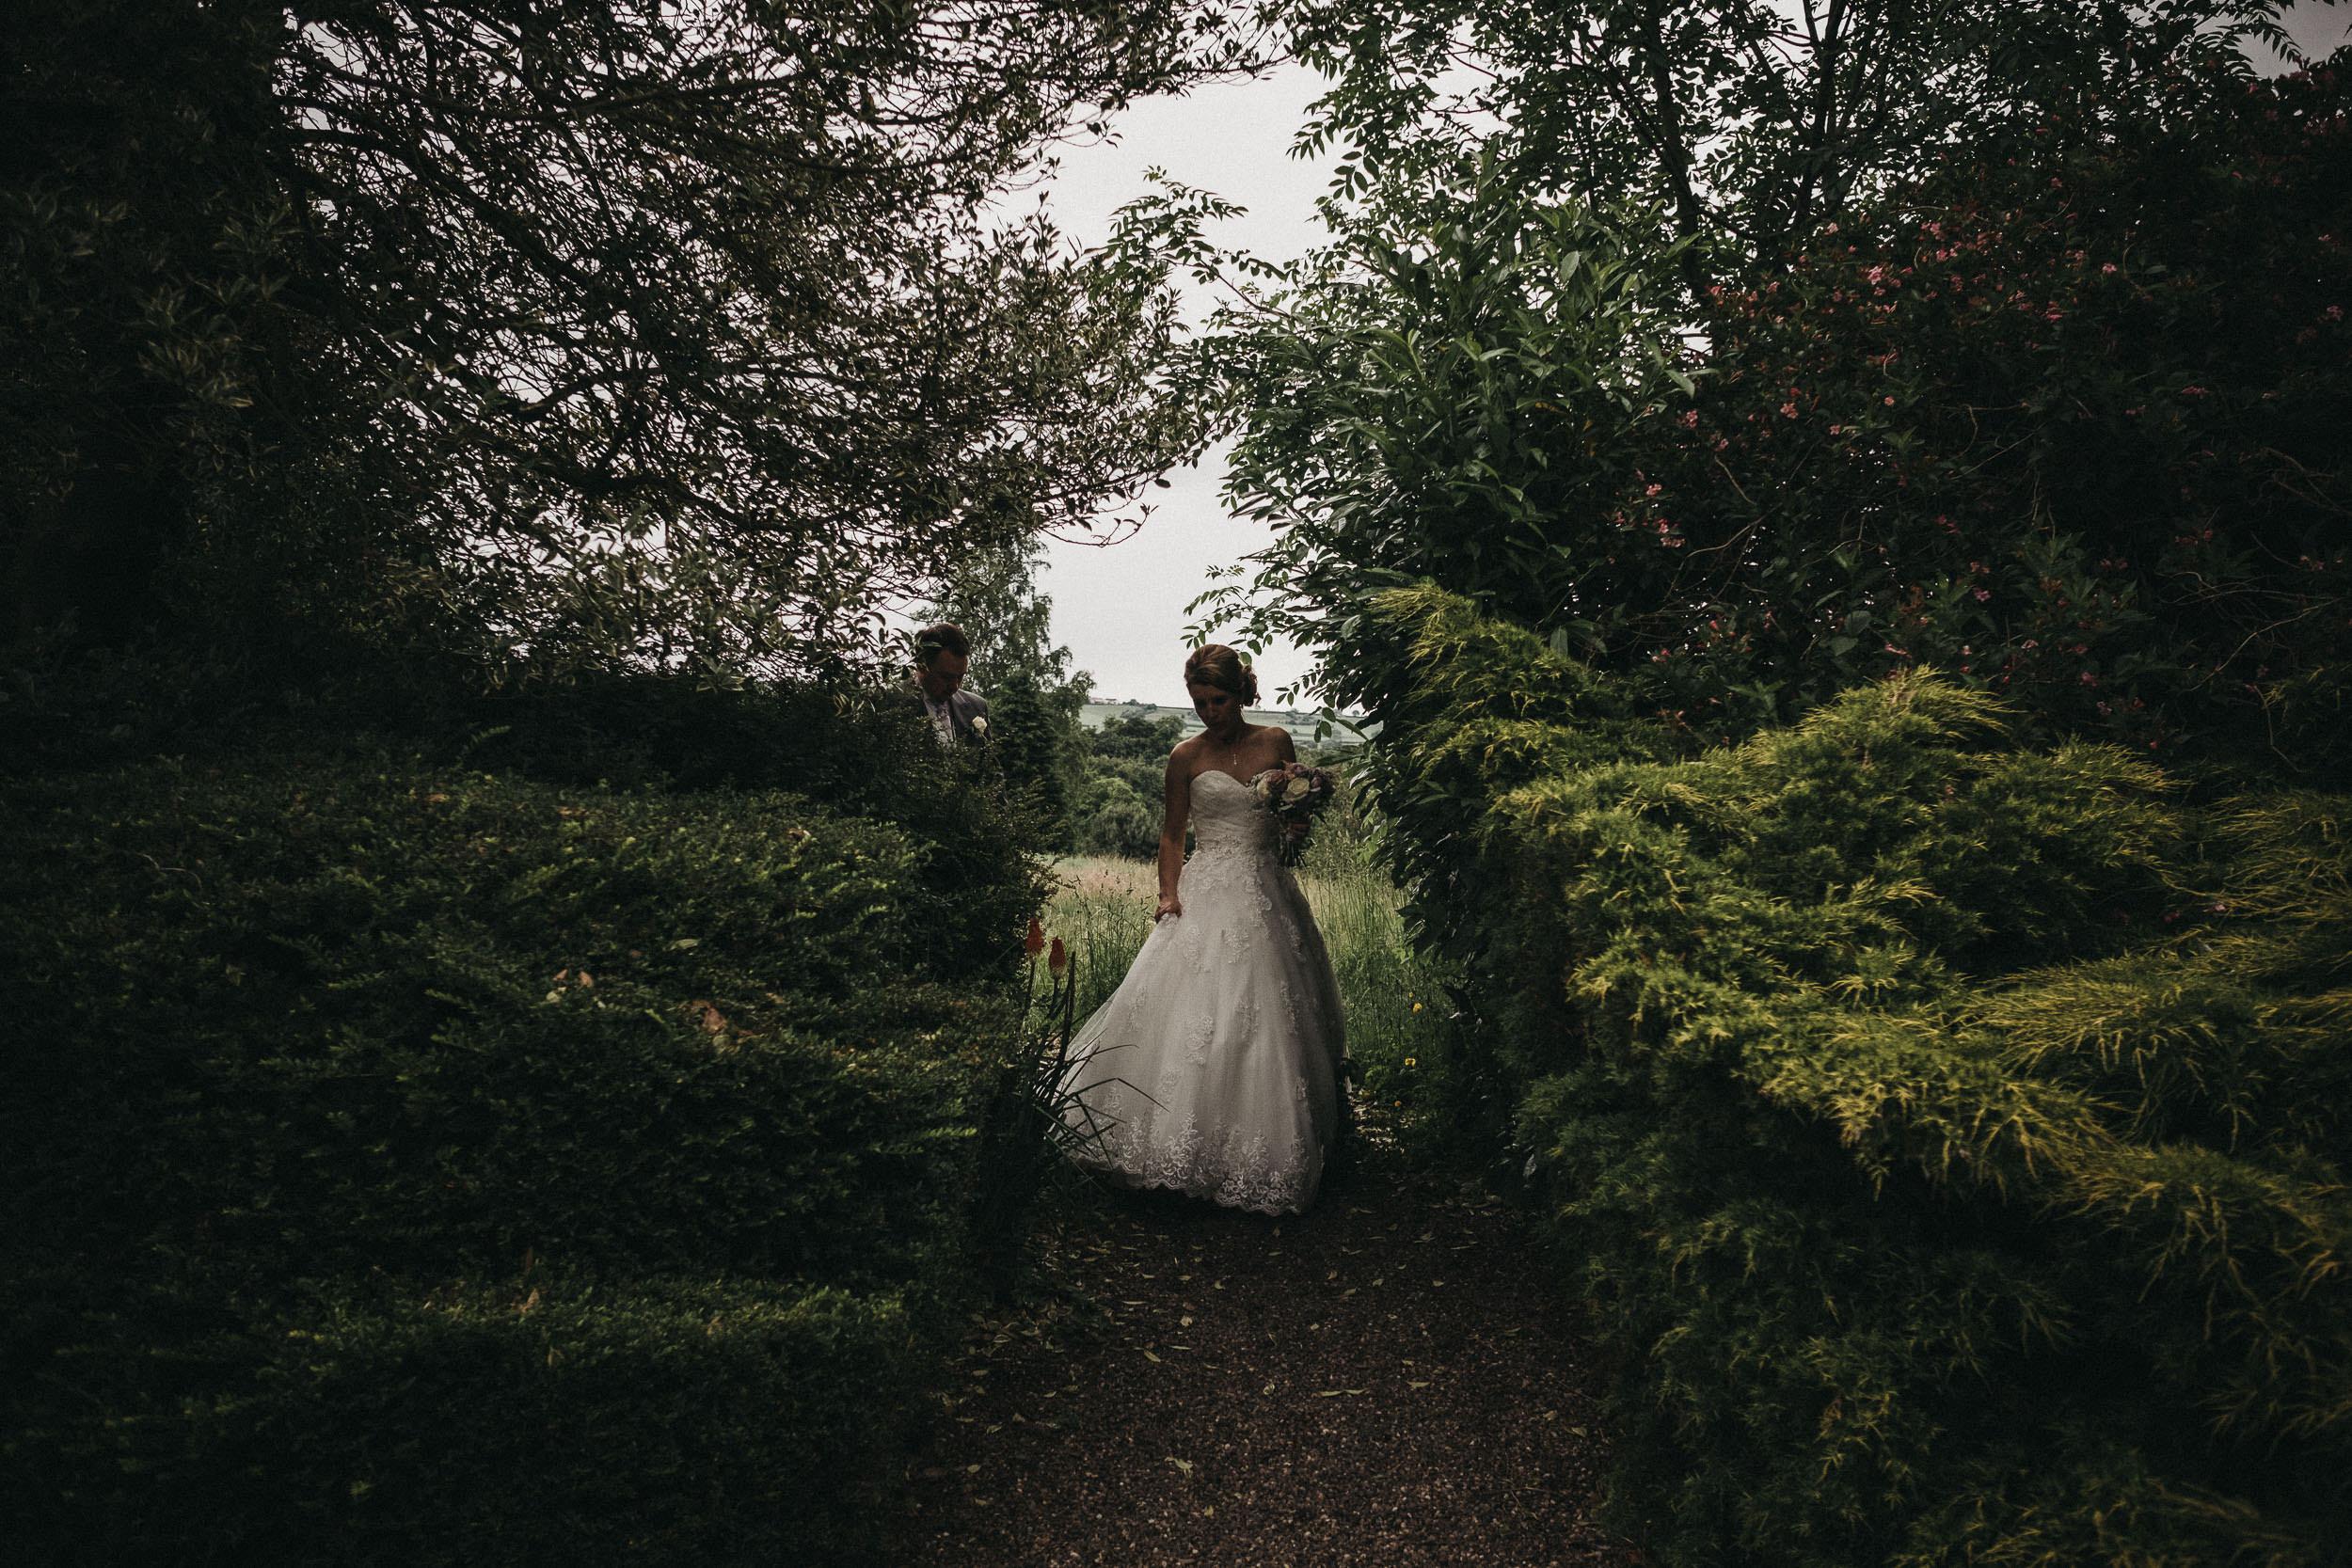 Moody photo of bride walking down narrow path between tall hedges